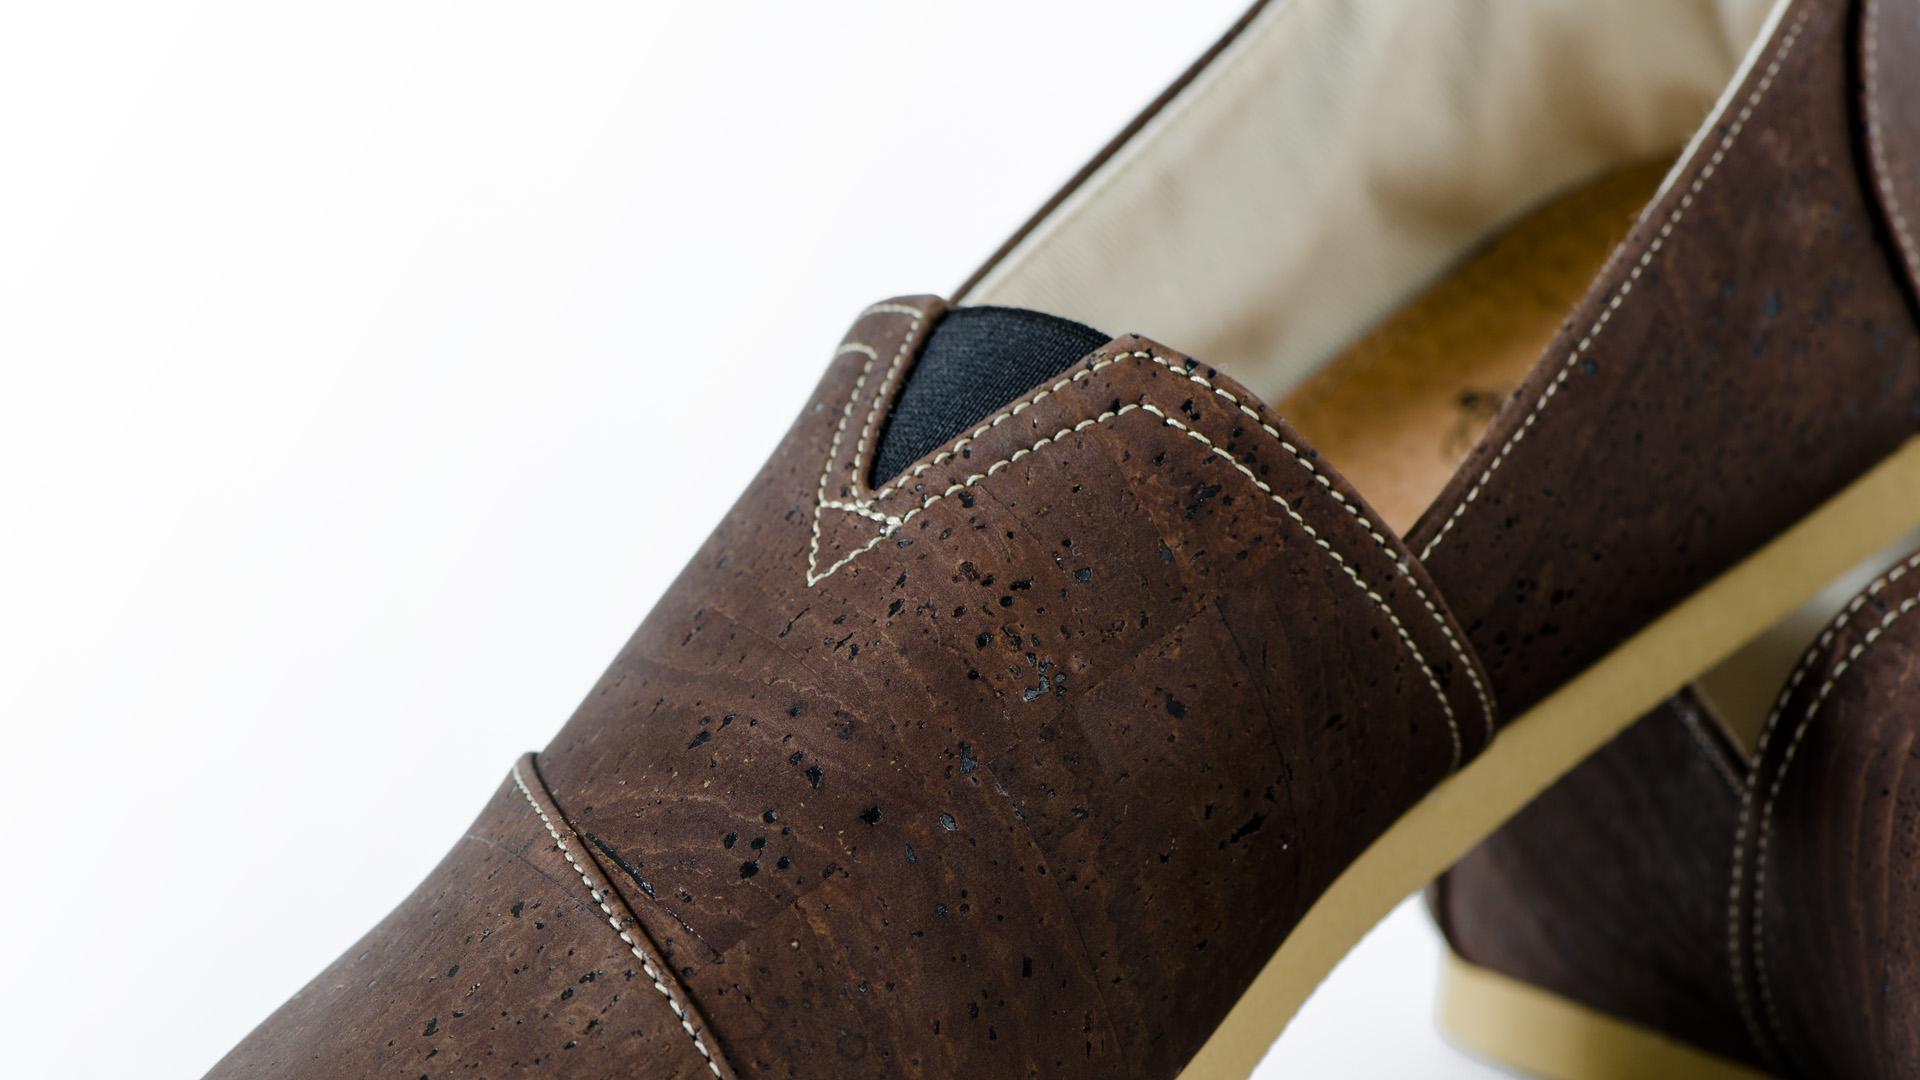 Schuhe, Kork, Korkschuhe, Espadrillas, Brown \ Beige, editorial